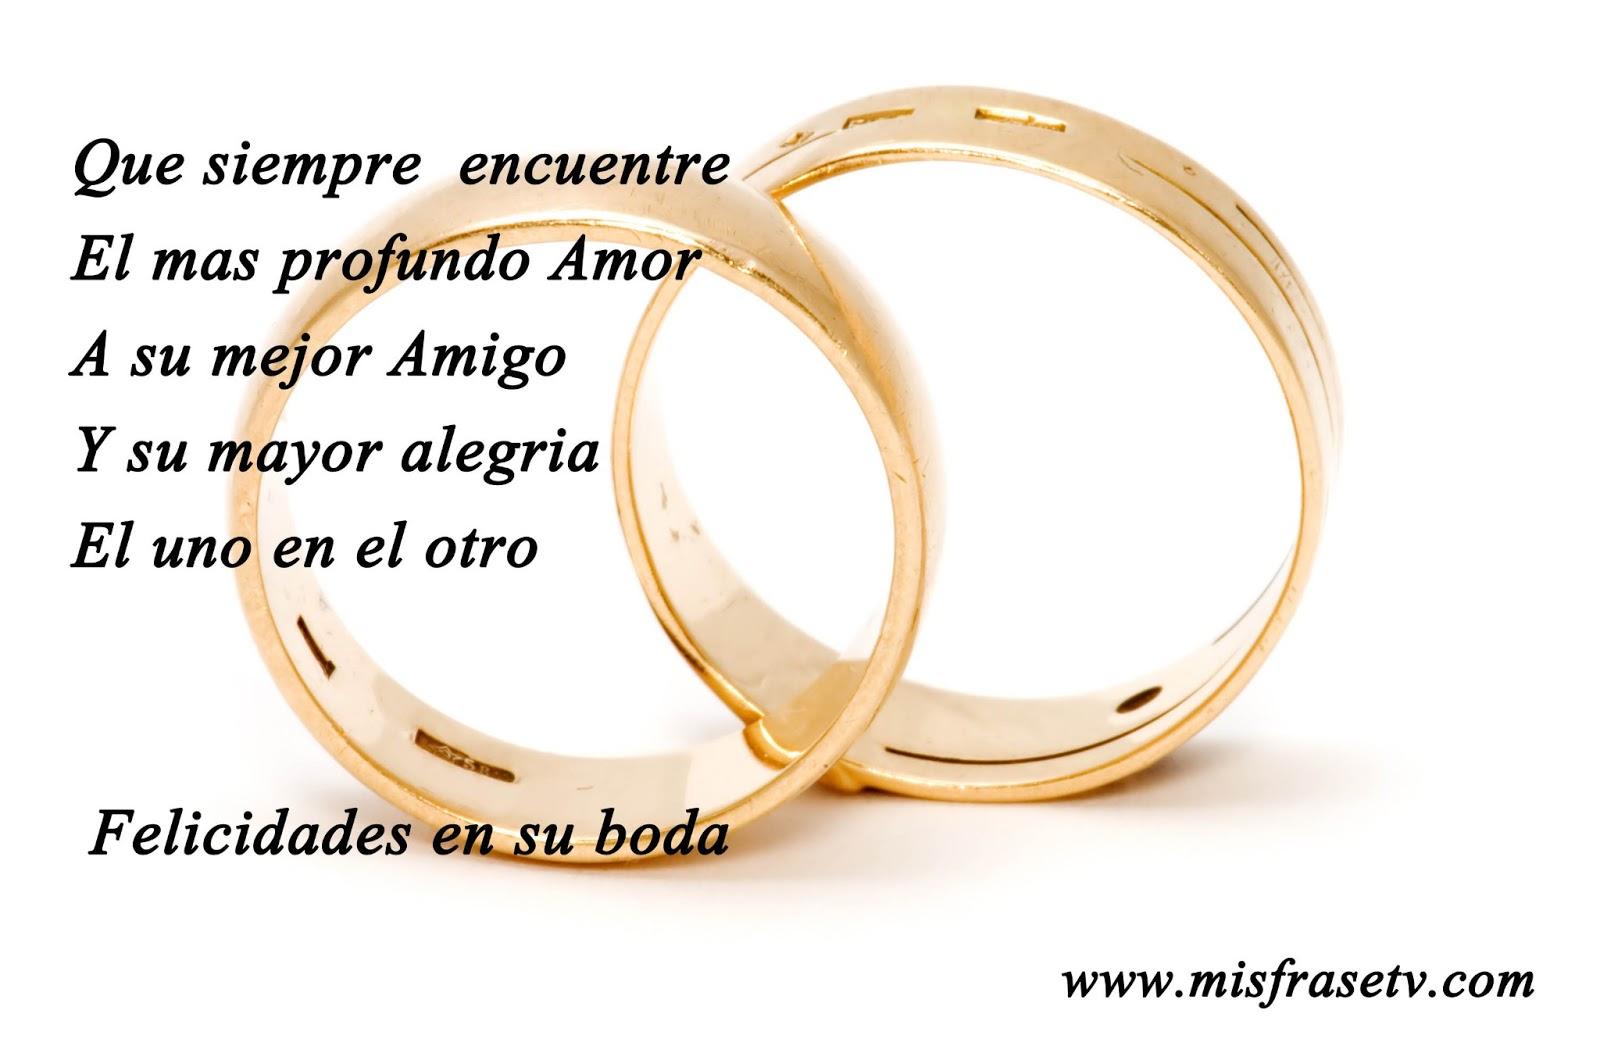 Top felicitaciones boda tarjetas de wallpapers - Tarjeta de boda ...